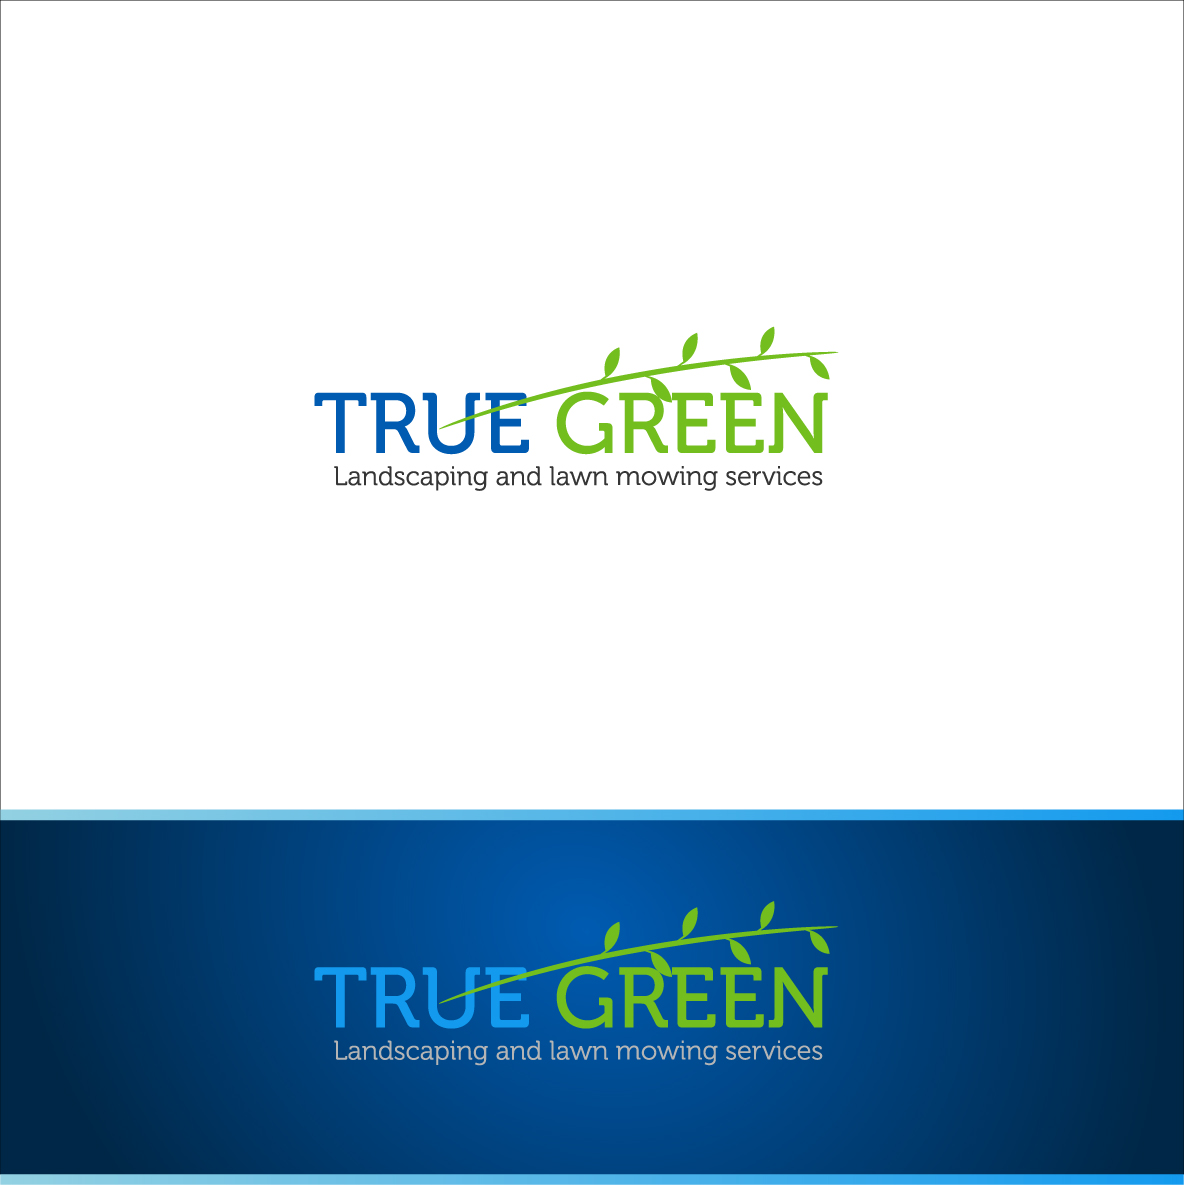 Logo Design by zoiDesign - Entry No. 31 in the Logo Design Contest Fun Logo Design for TRUE GREEN.